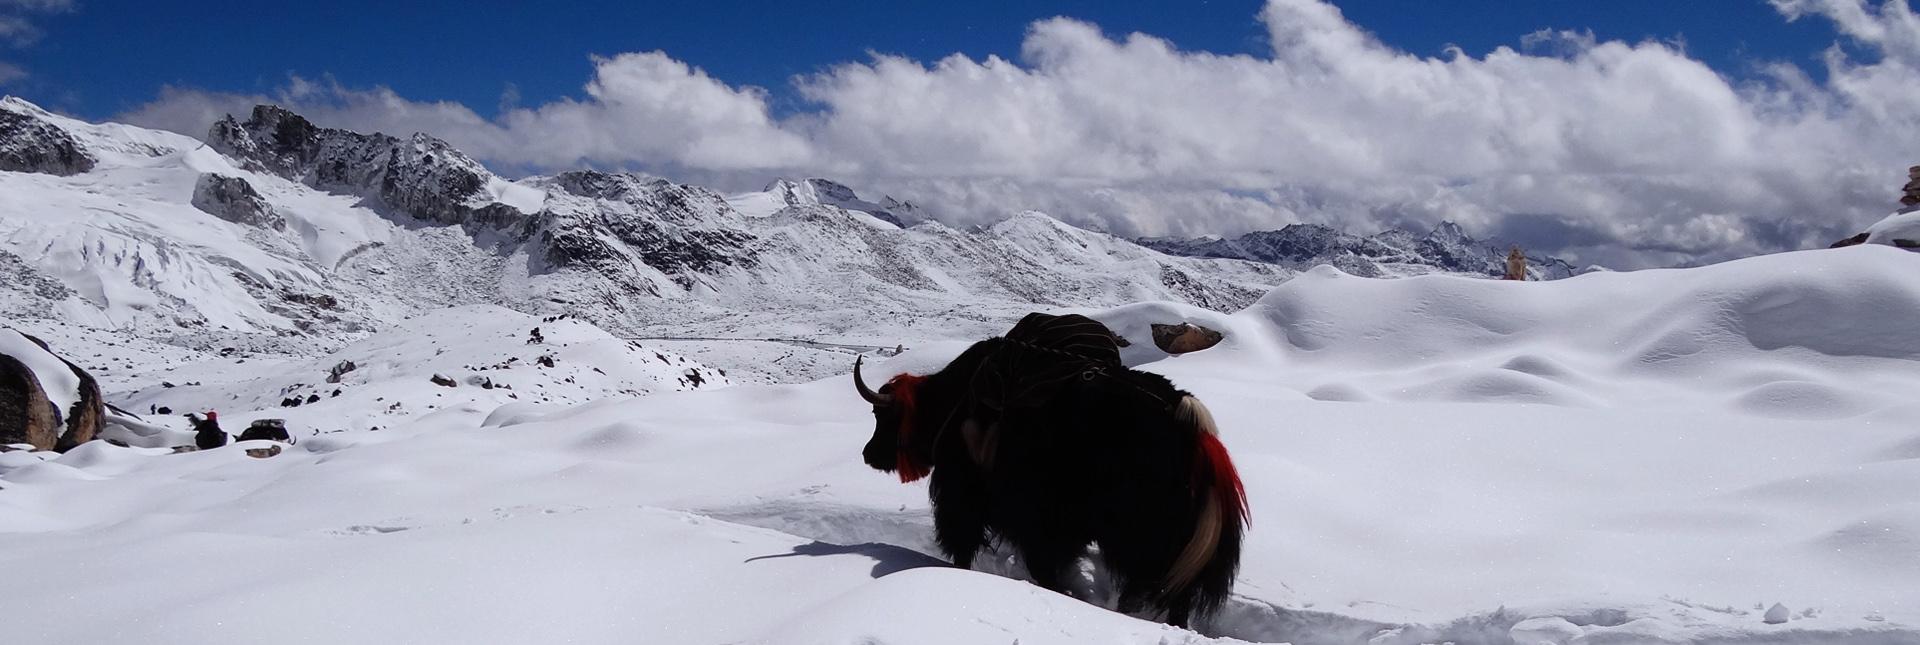 Traversing past a Yak during the Snowman Trek